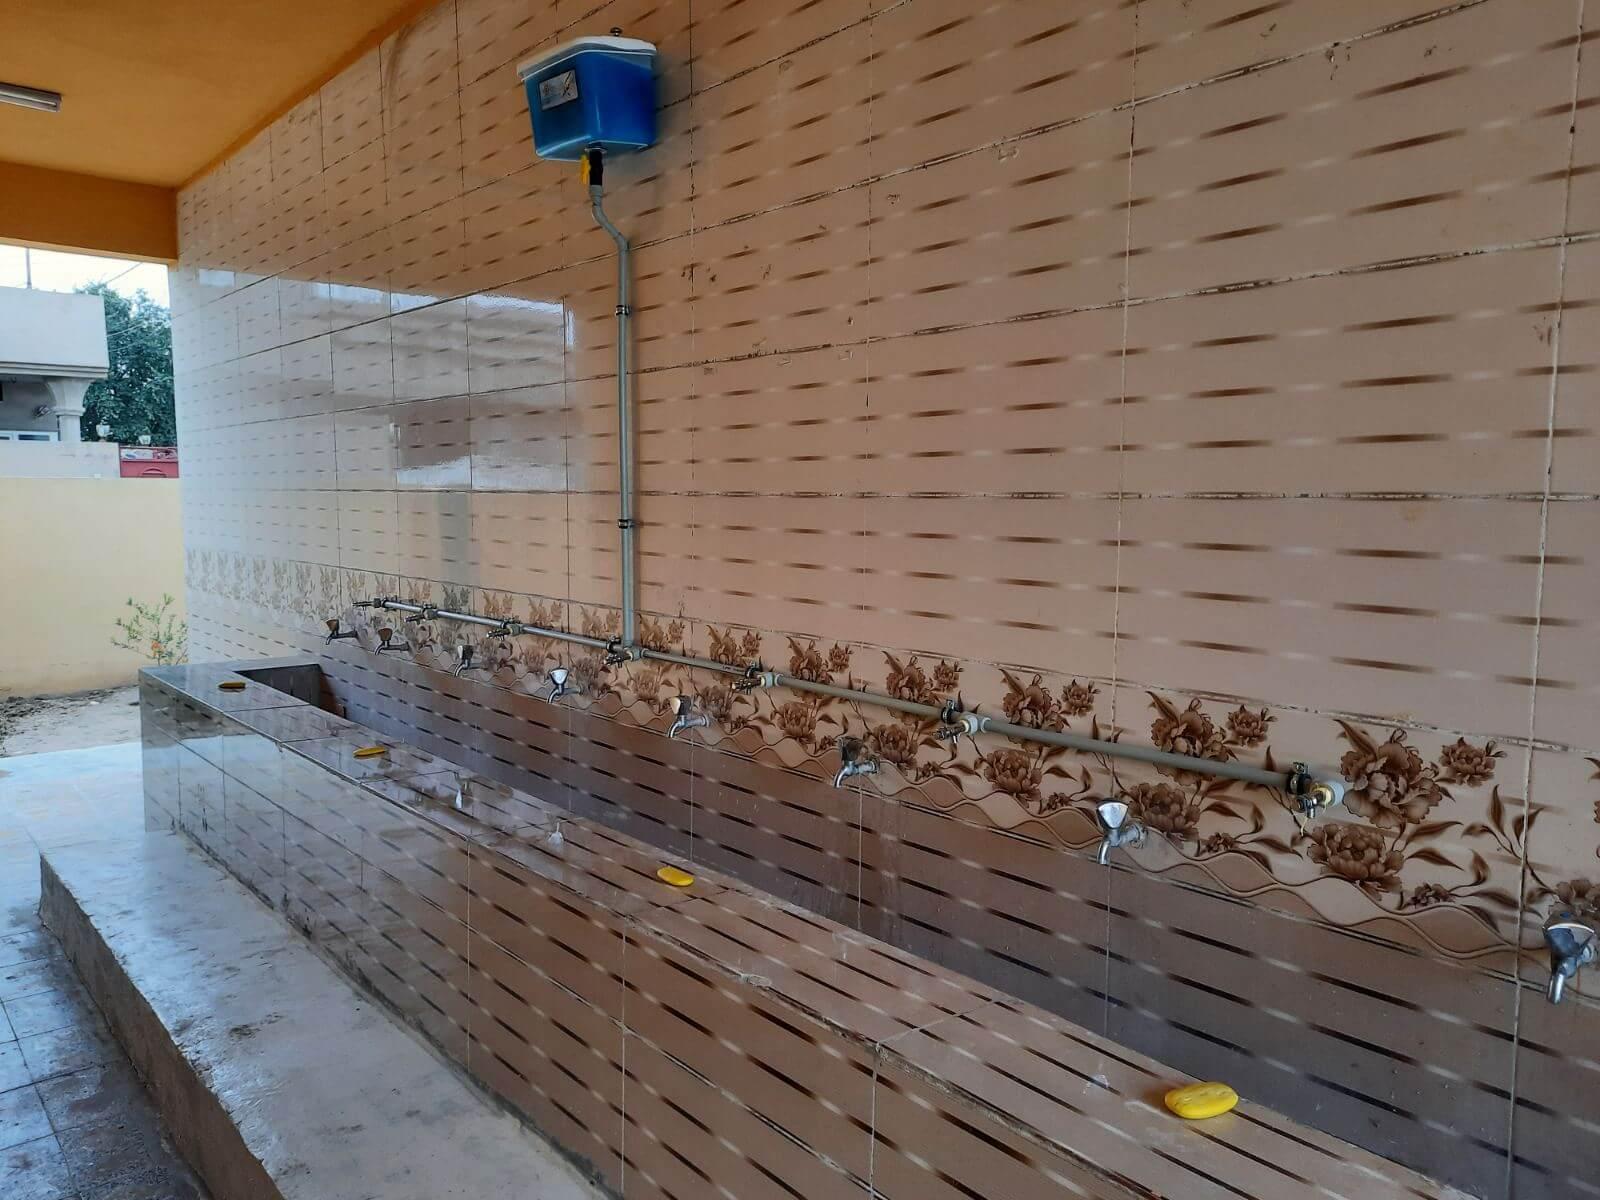 1- Establishing a liquid soap system in schools under cash for work